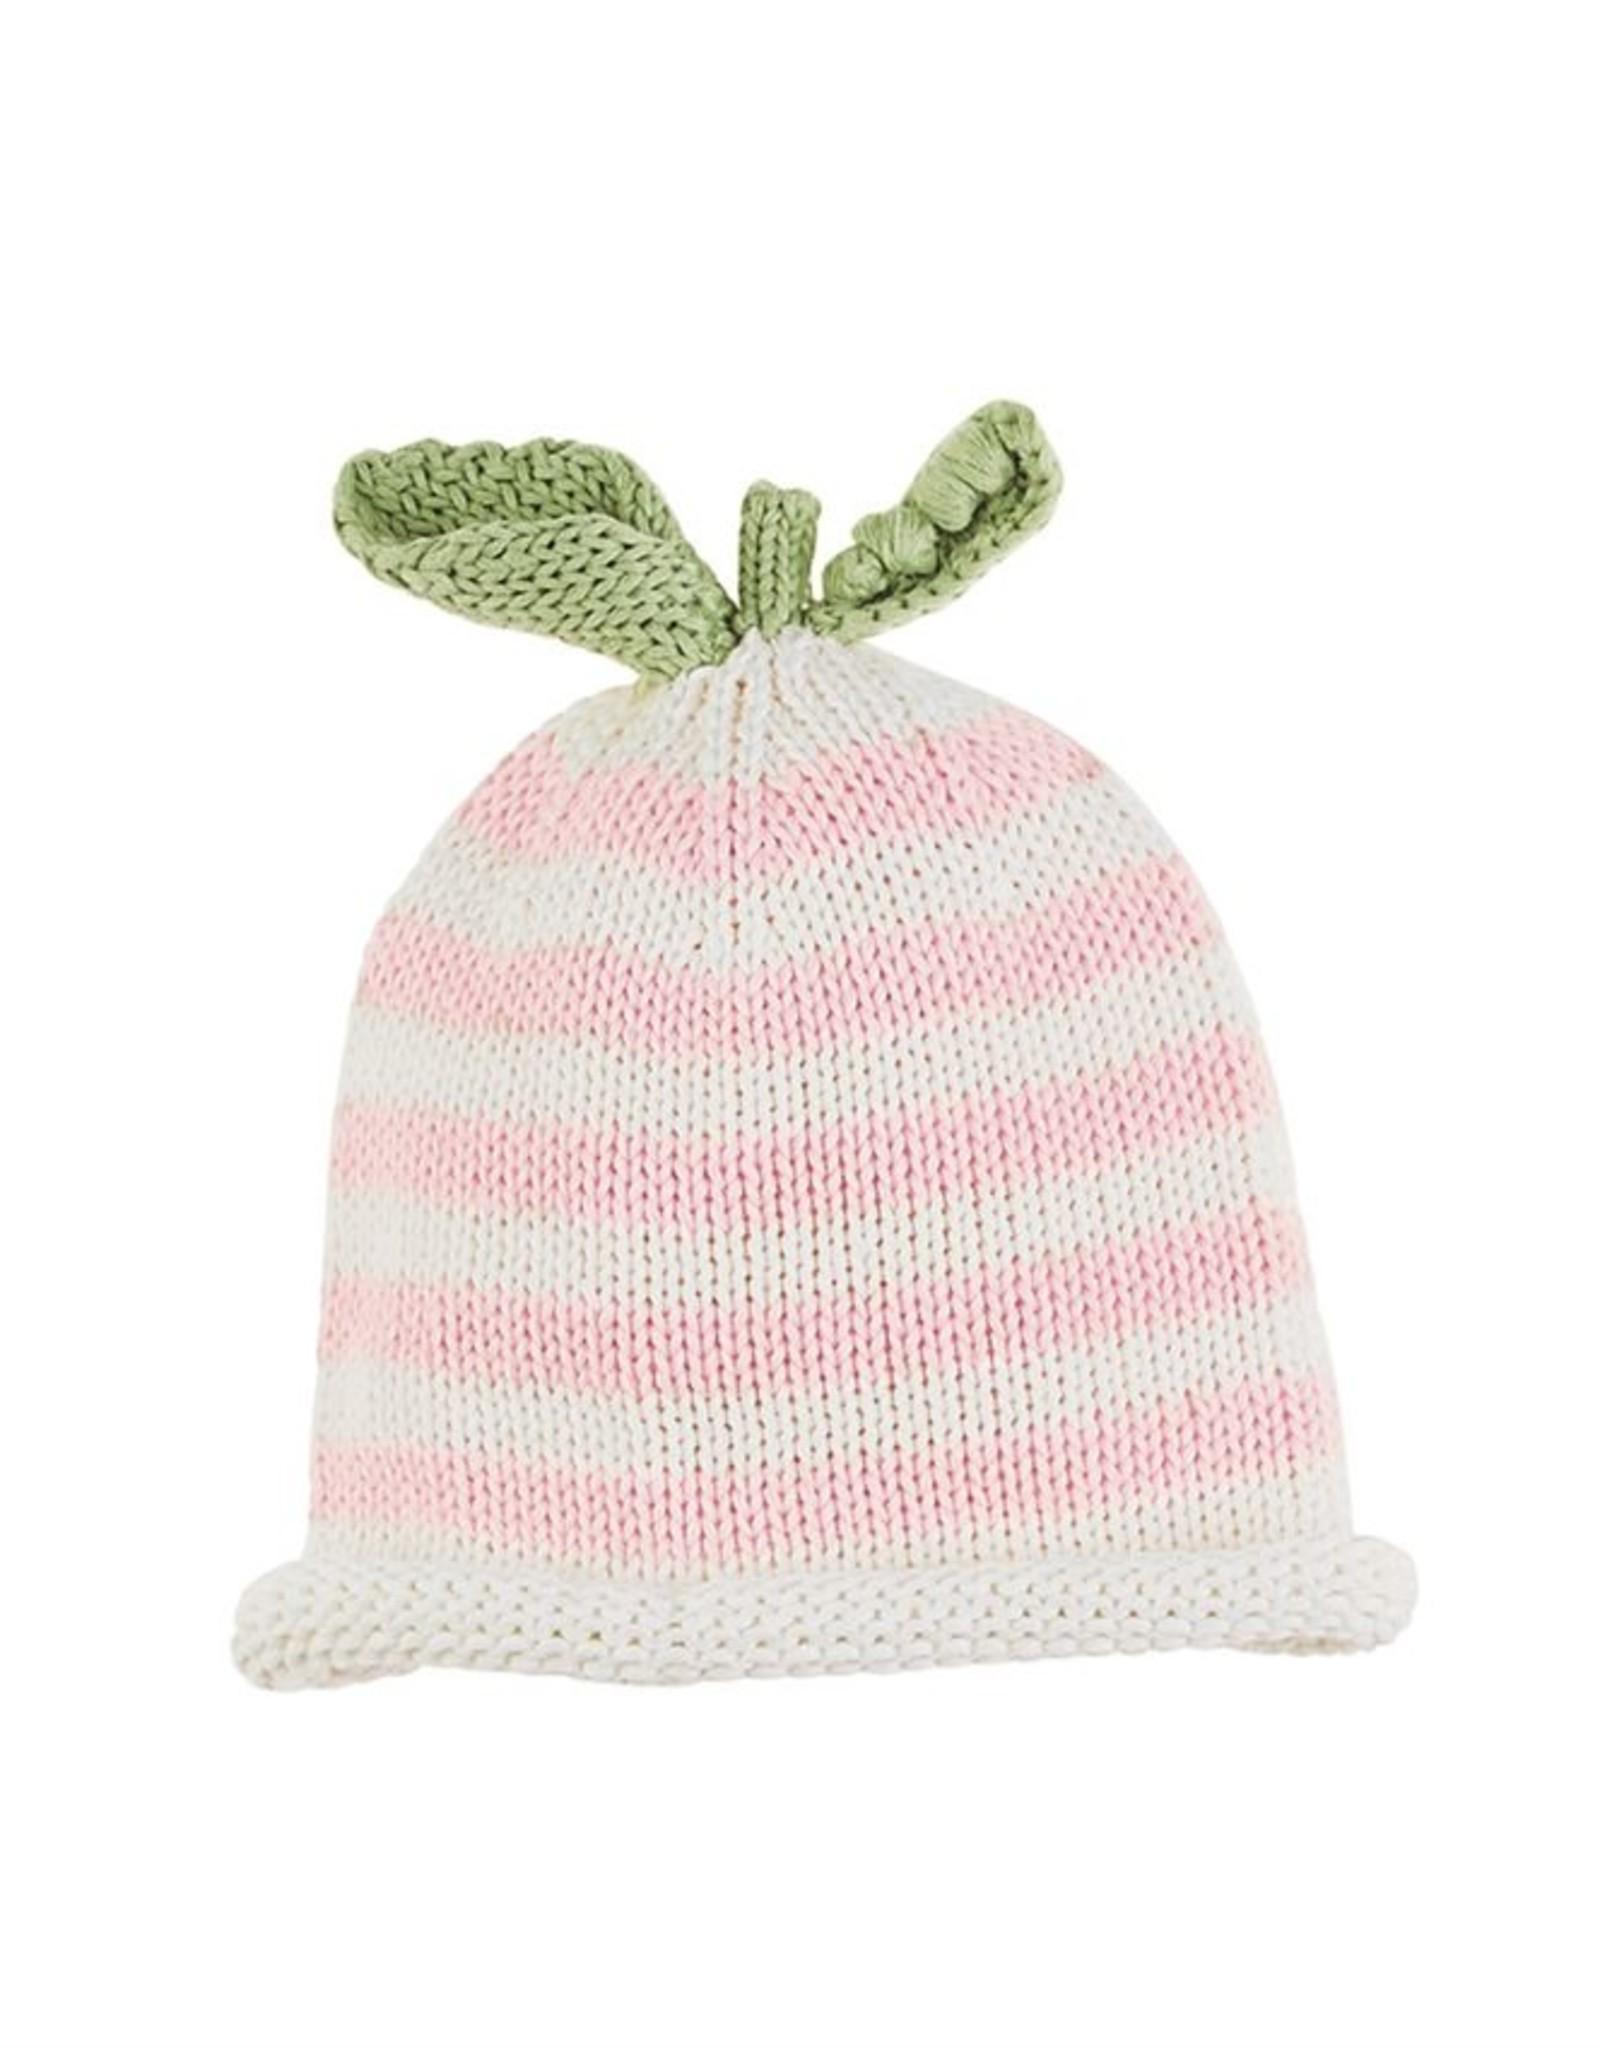 Pea Knit Hat